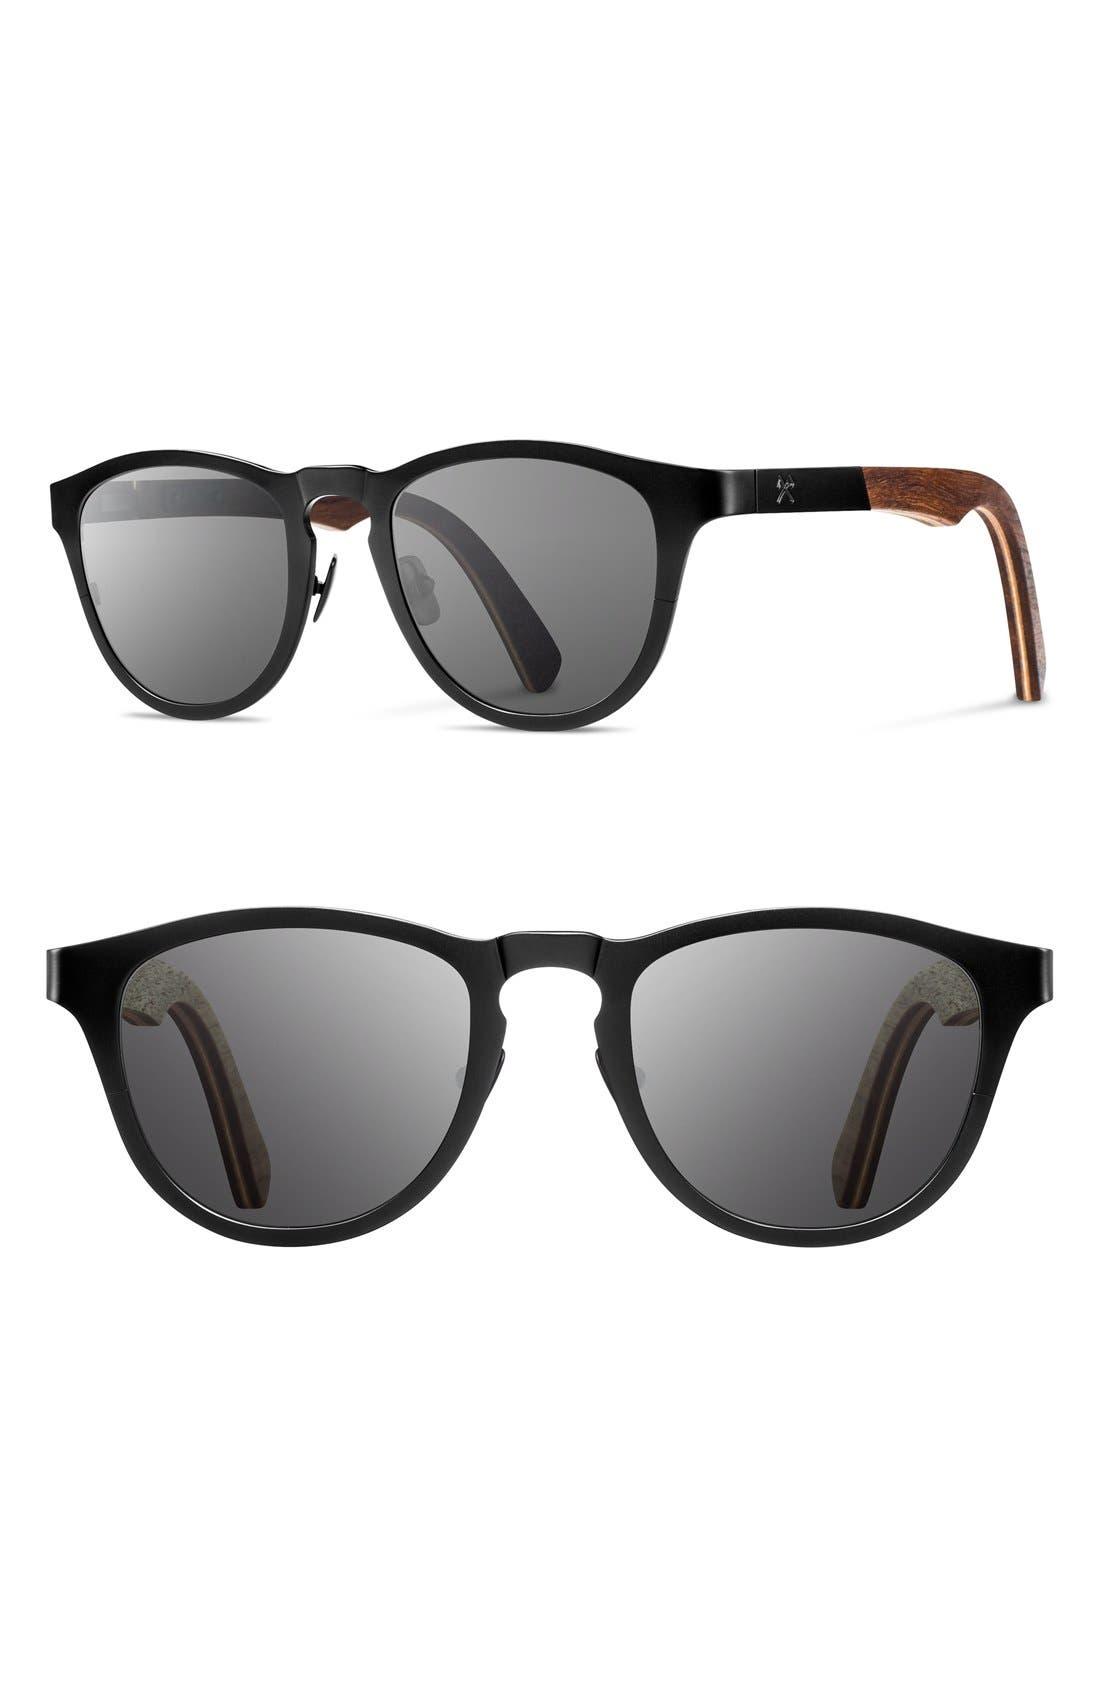 Main Image - Shwood 'Francis' 49mm Titanium & Wood Sunglasses